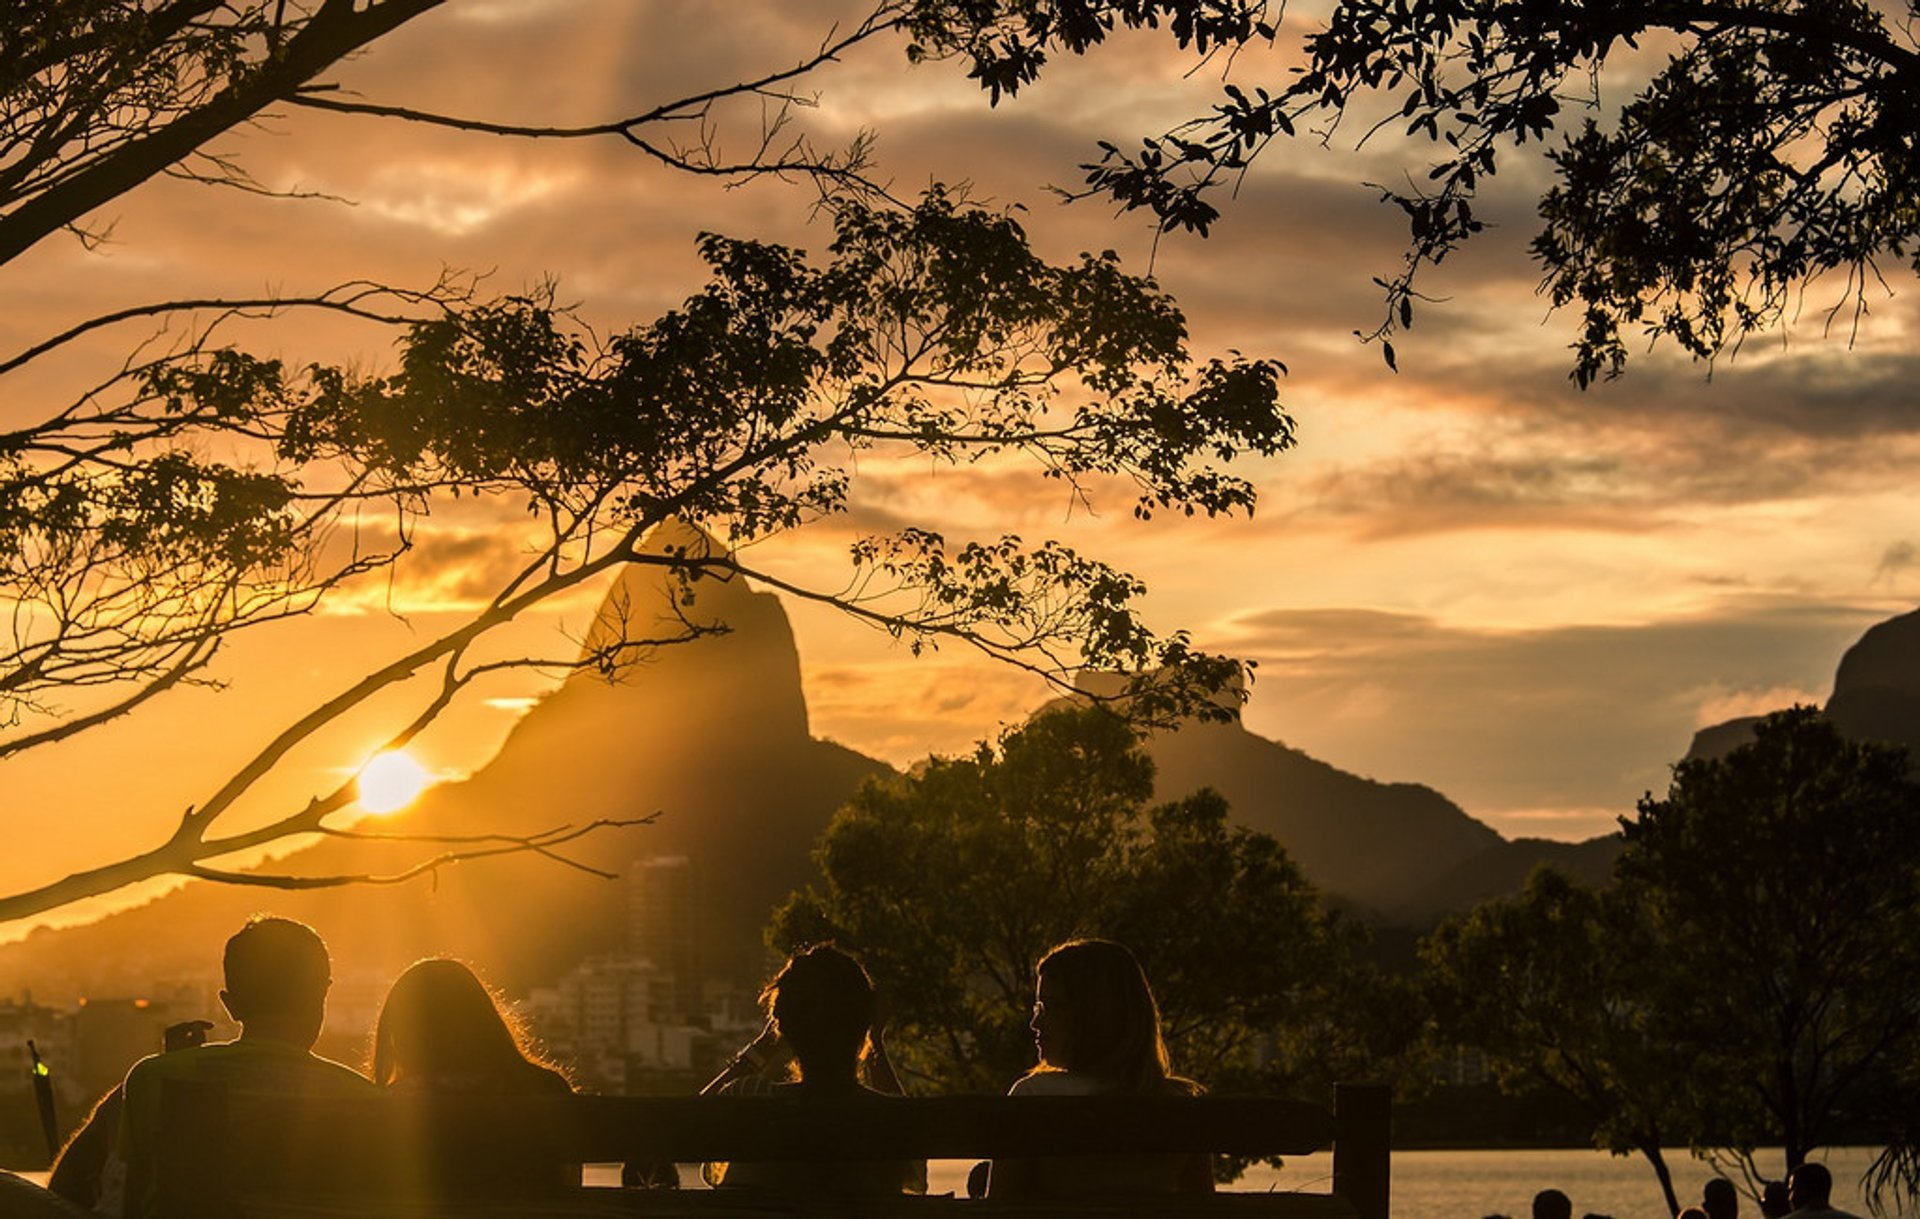 Watching the Sunset in Rio de Janeiro - Best Season